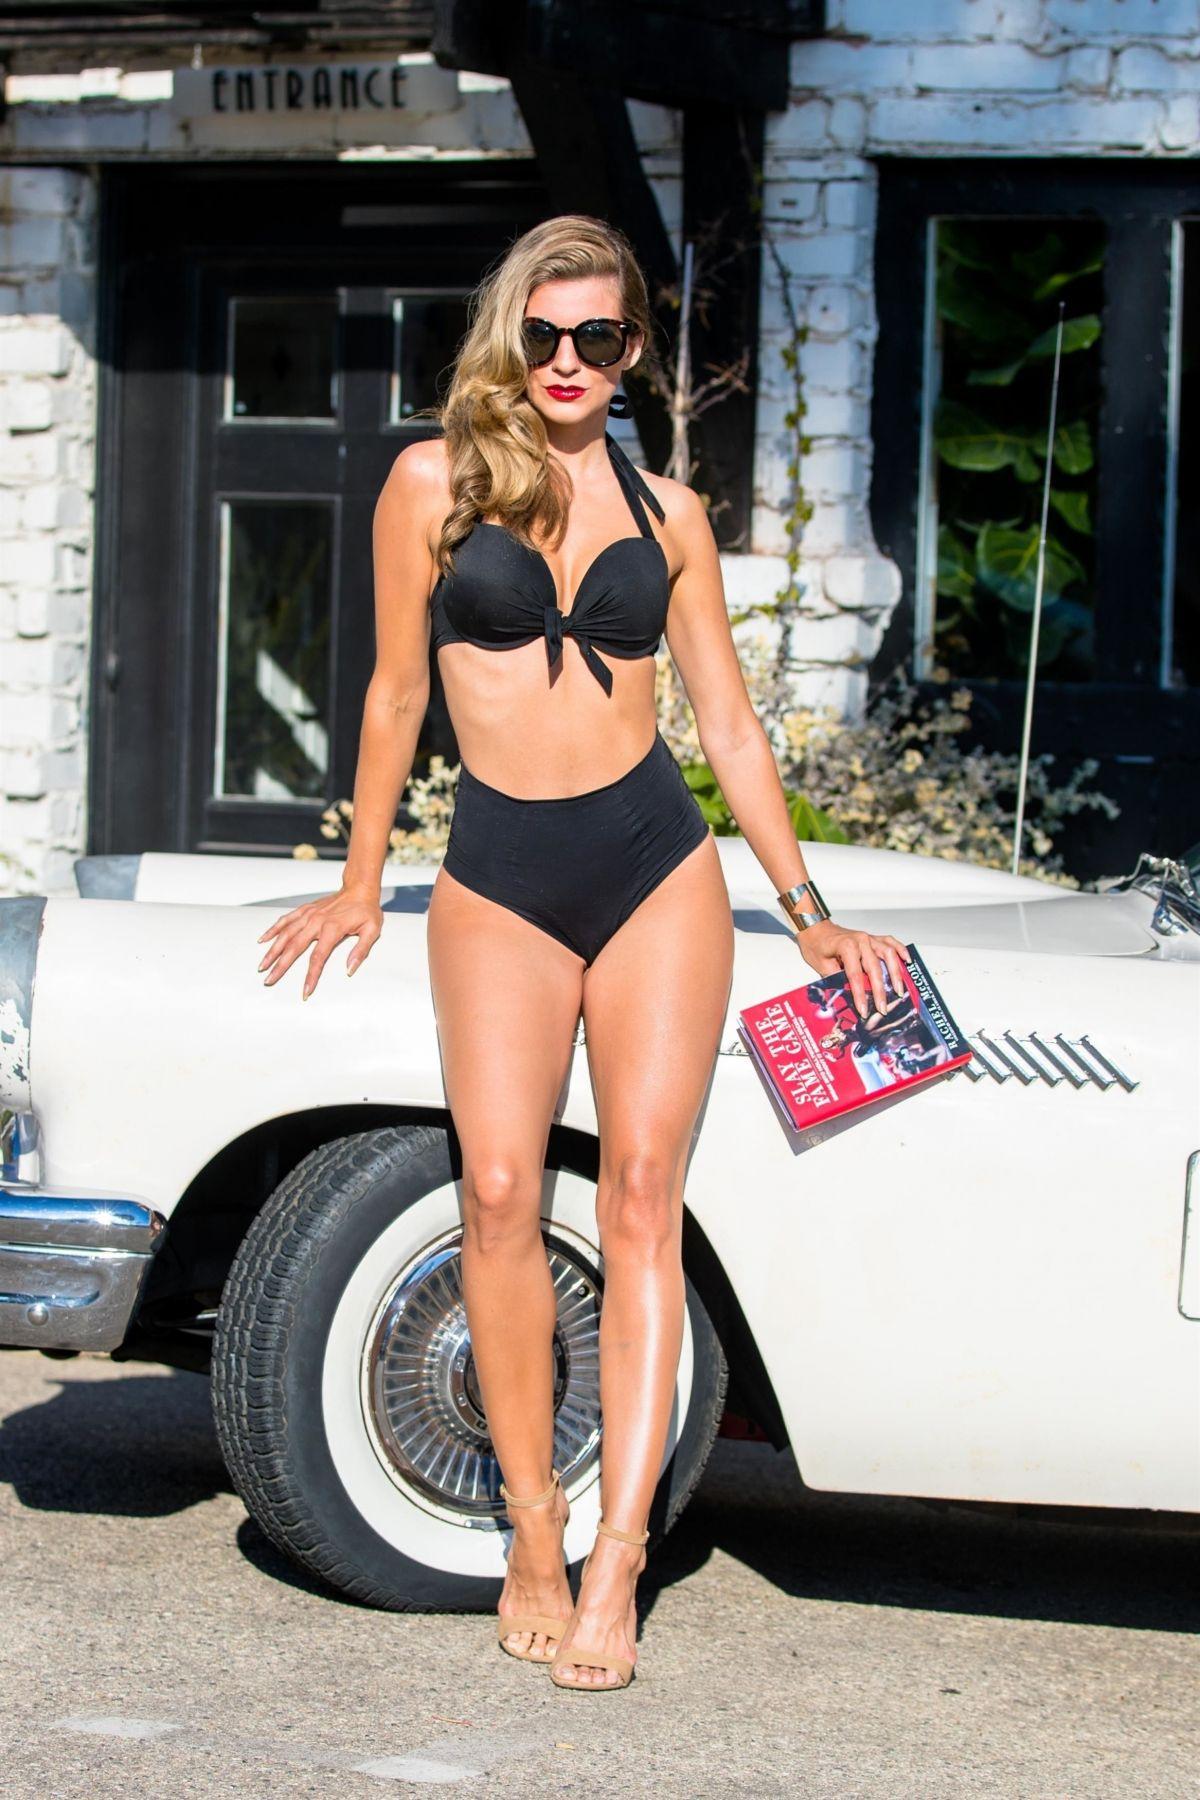 RACHEL MCCORD in Bikini on the Set of a Photoshoot in Malibu 08/27/2017